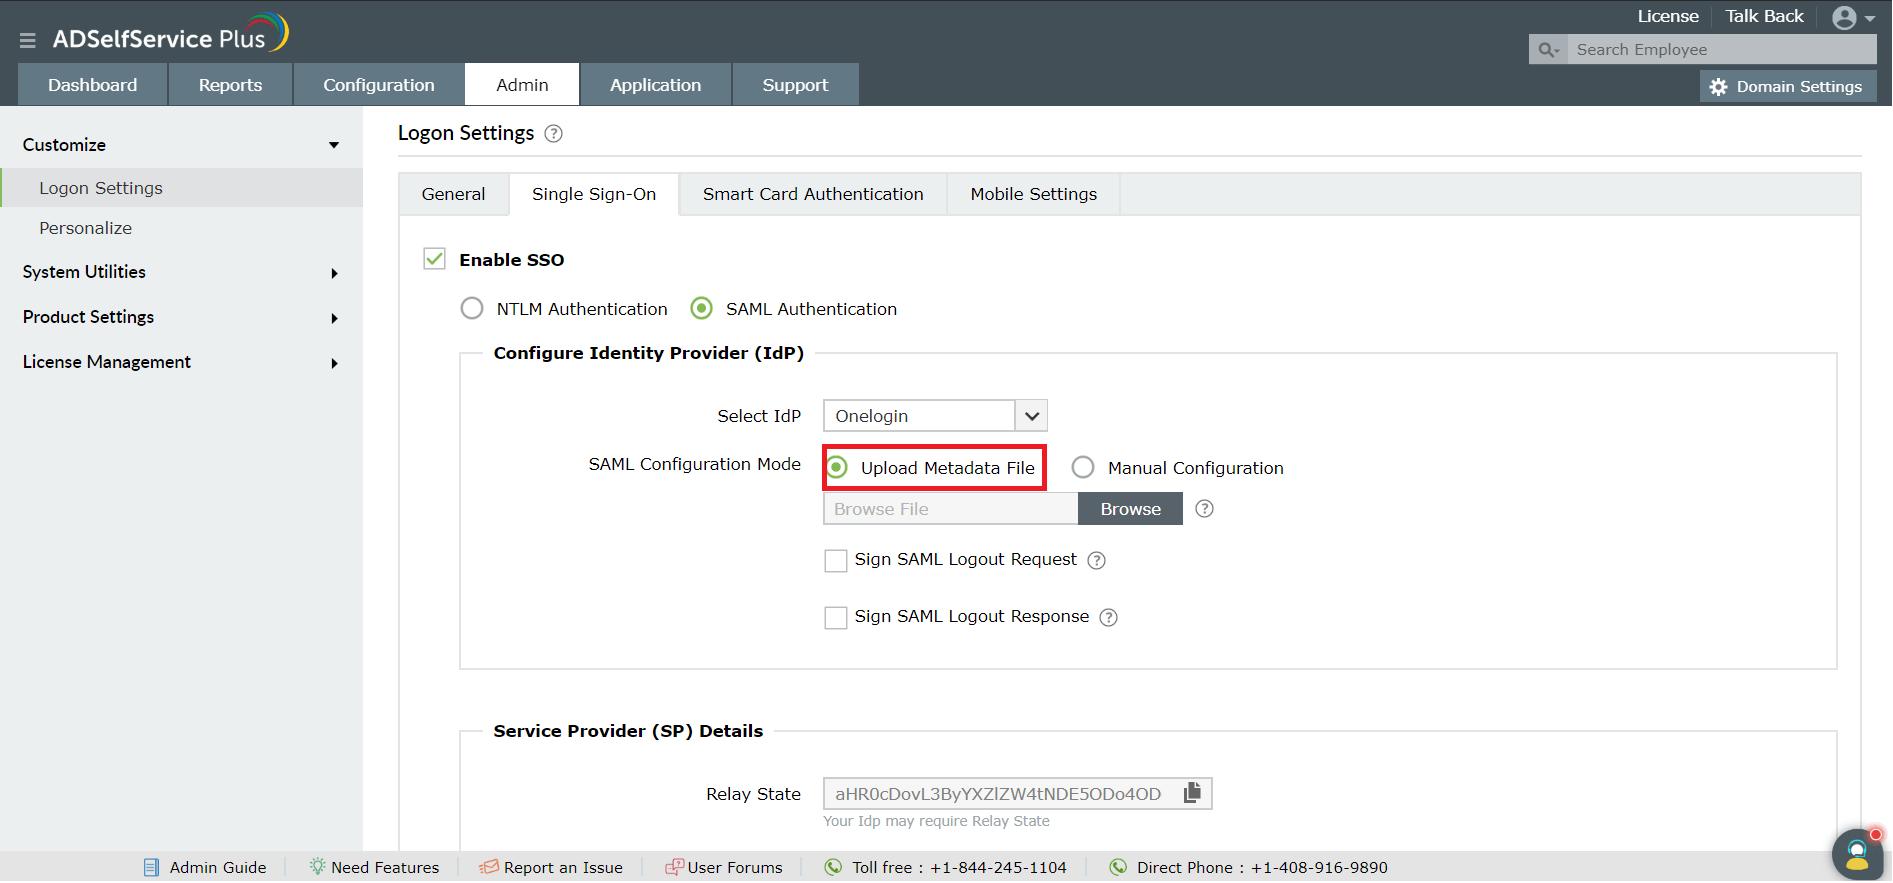 sso-logon-settings